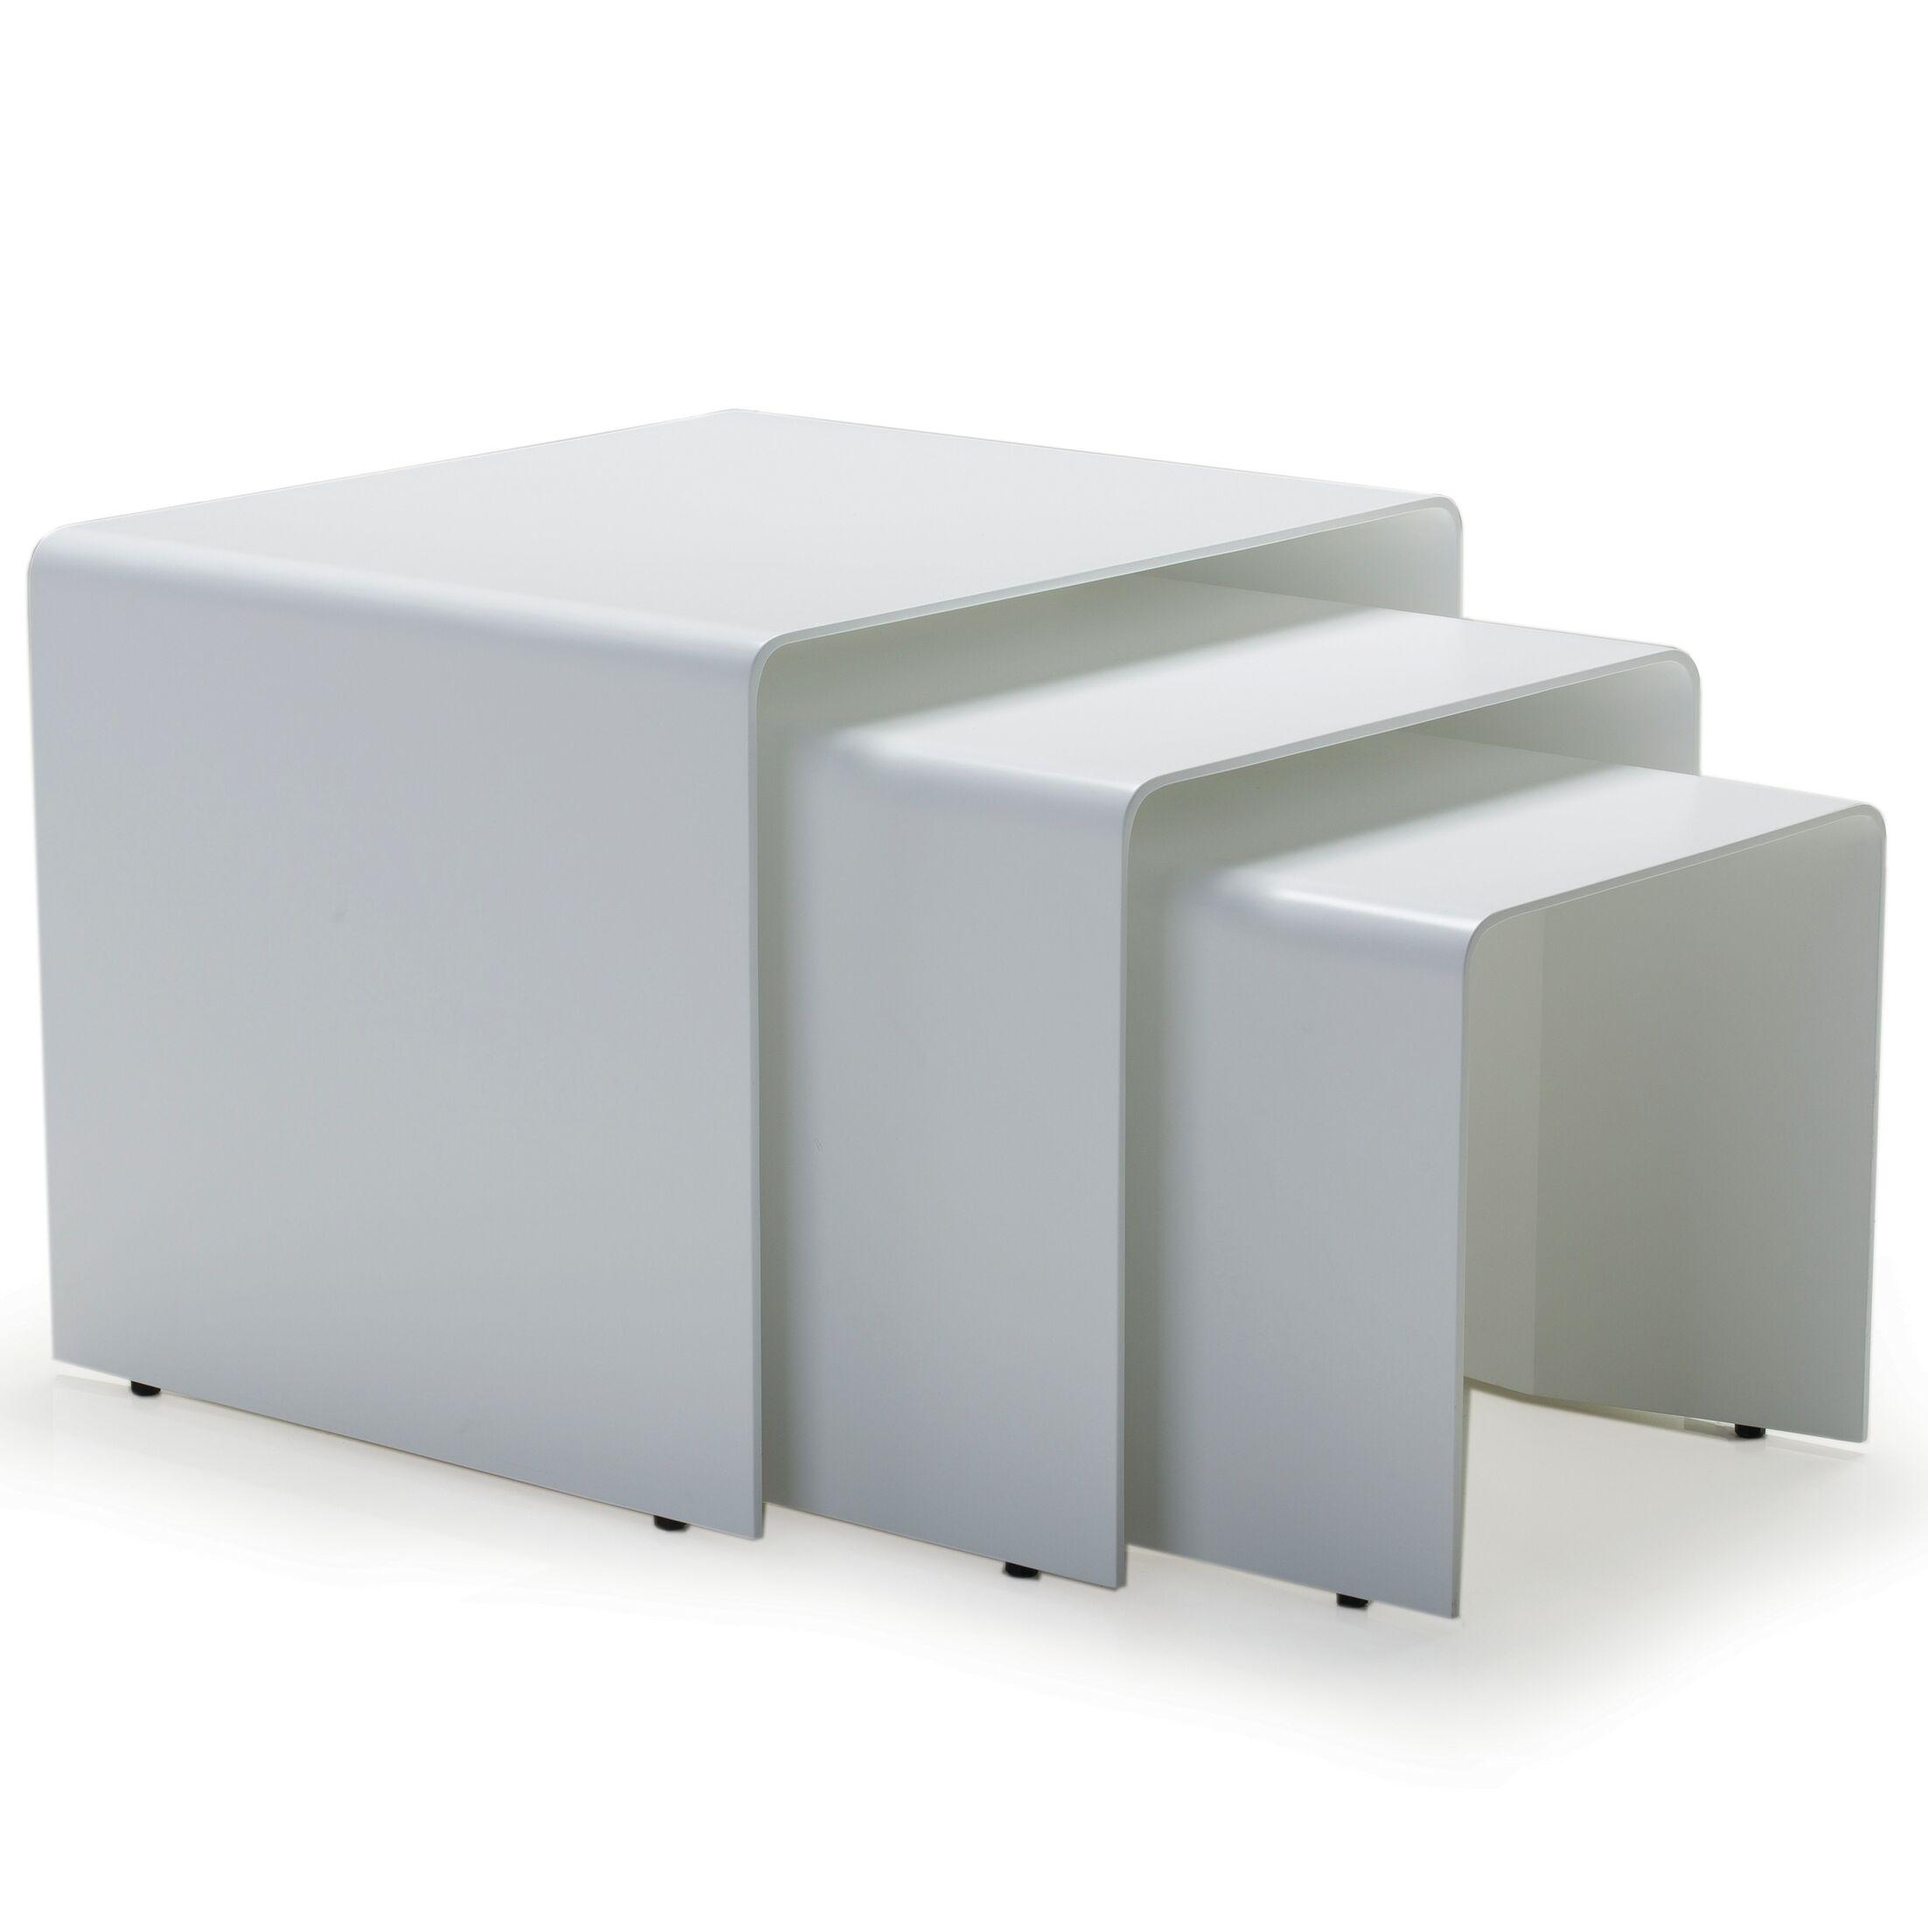 Athema 3 Piece Nesting Tables